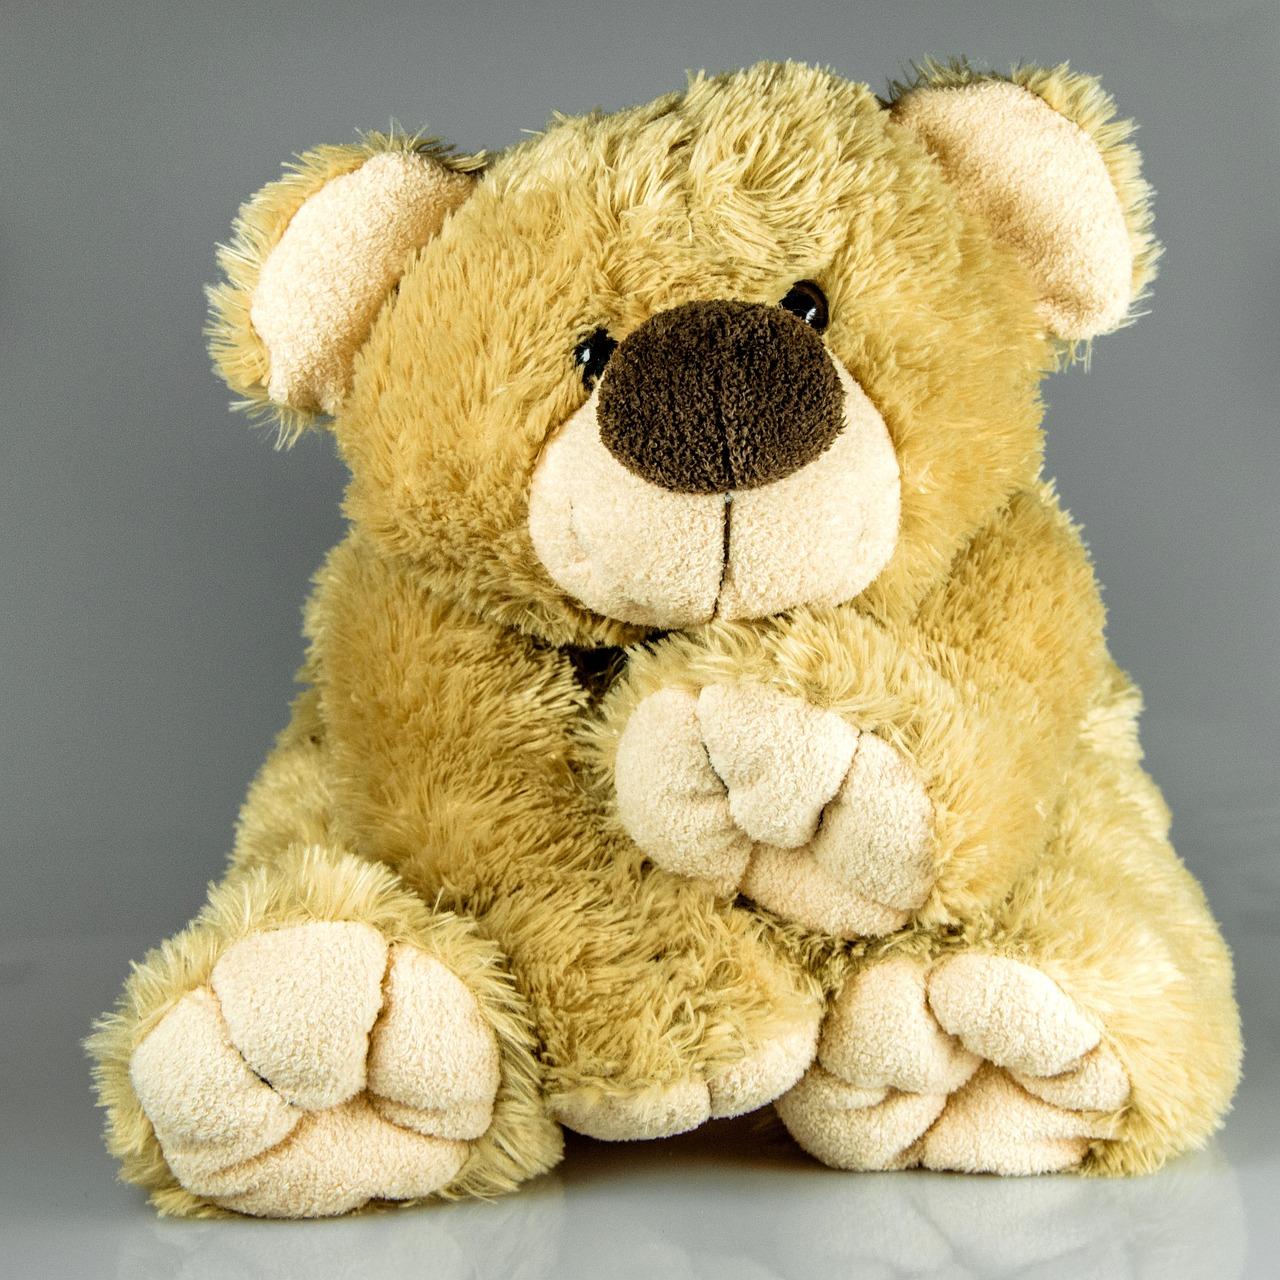 Фото с медвежонком игрушкой